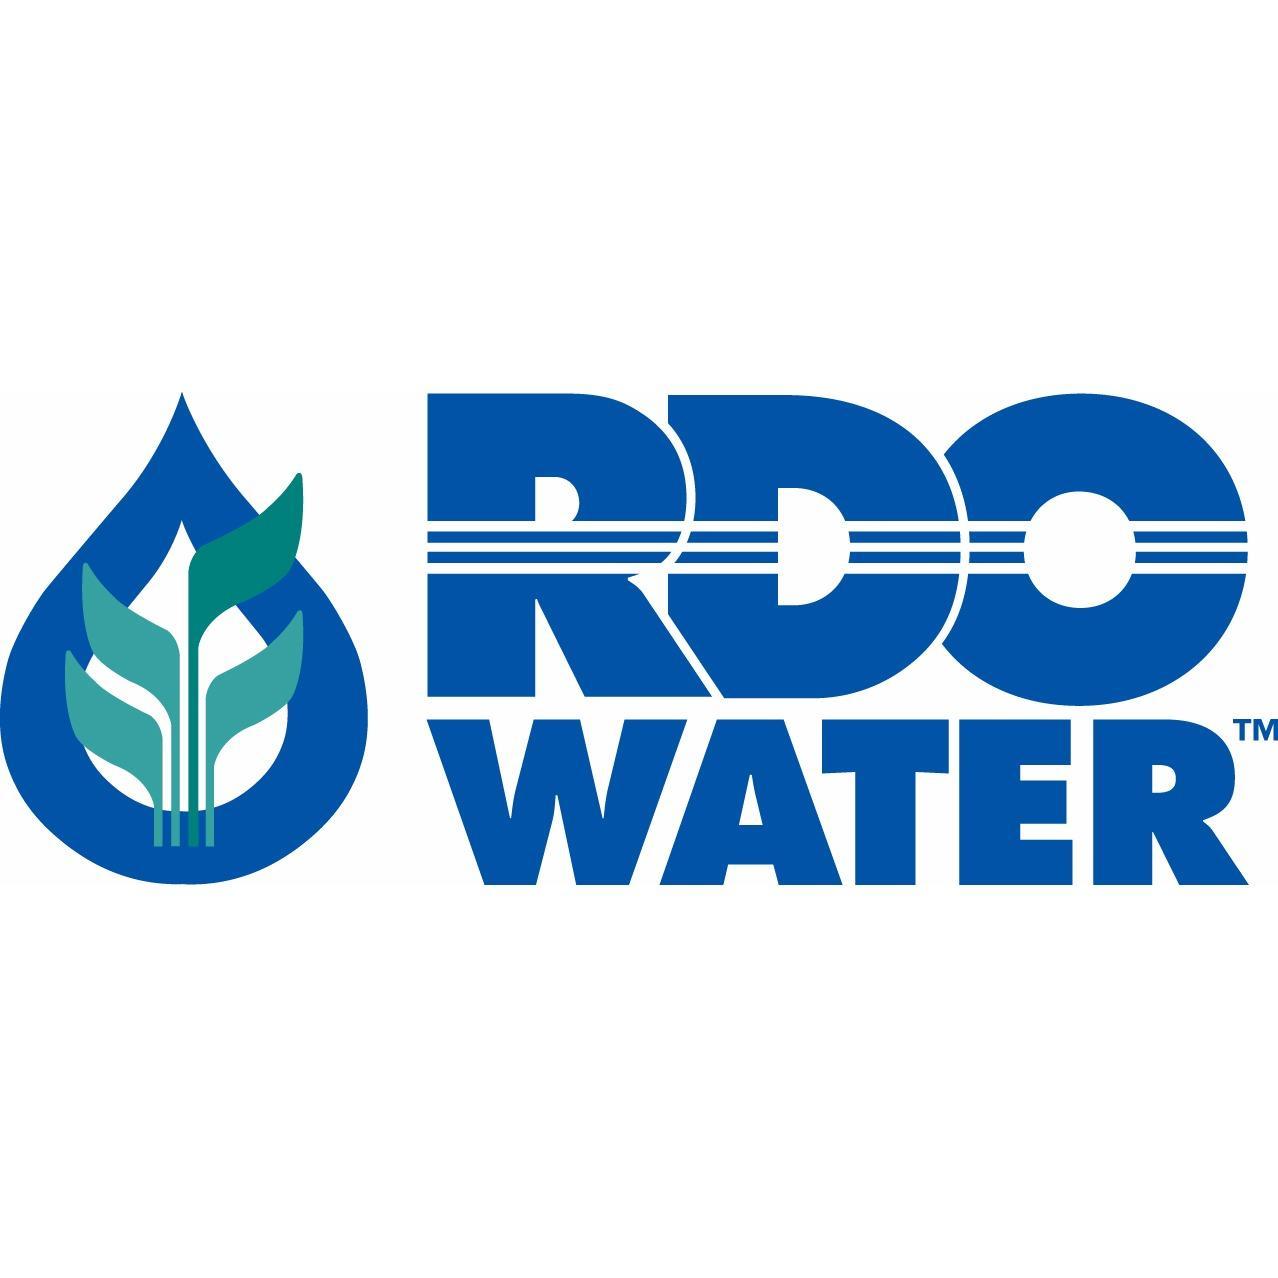 RDO Water image 9